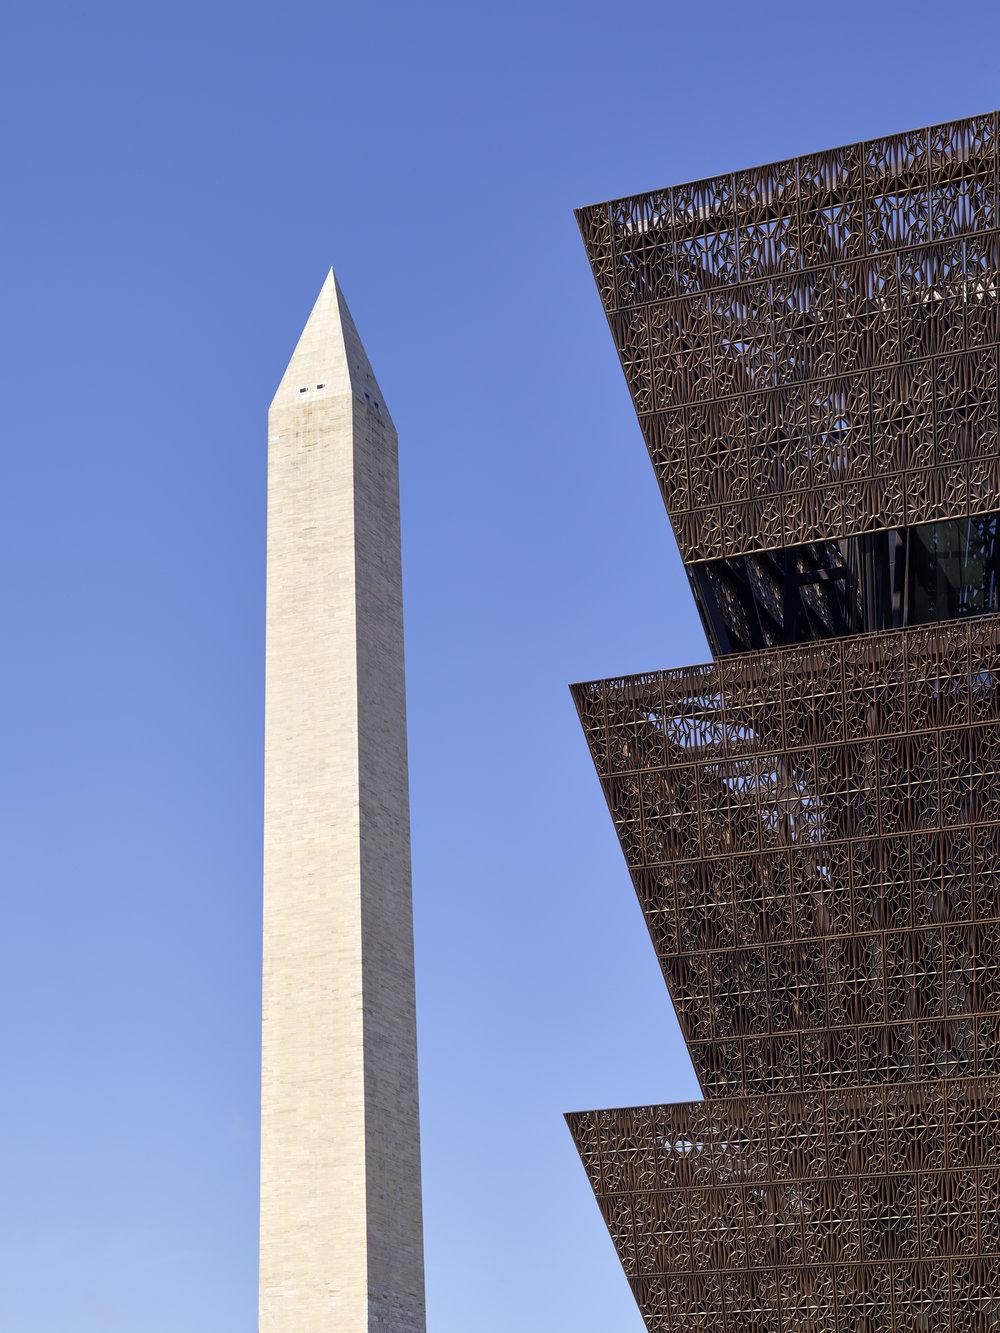 Two Grand Prize winners will win a trip to Washington DC!